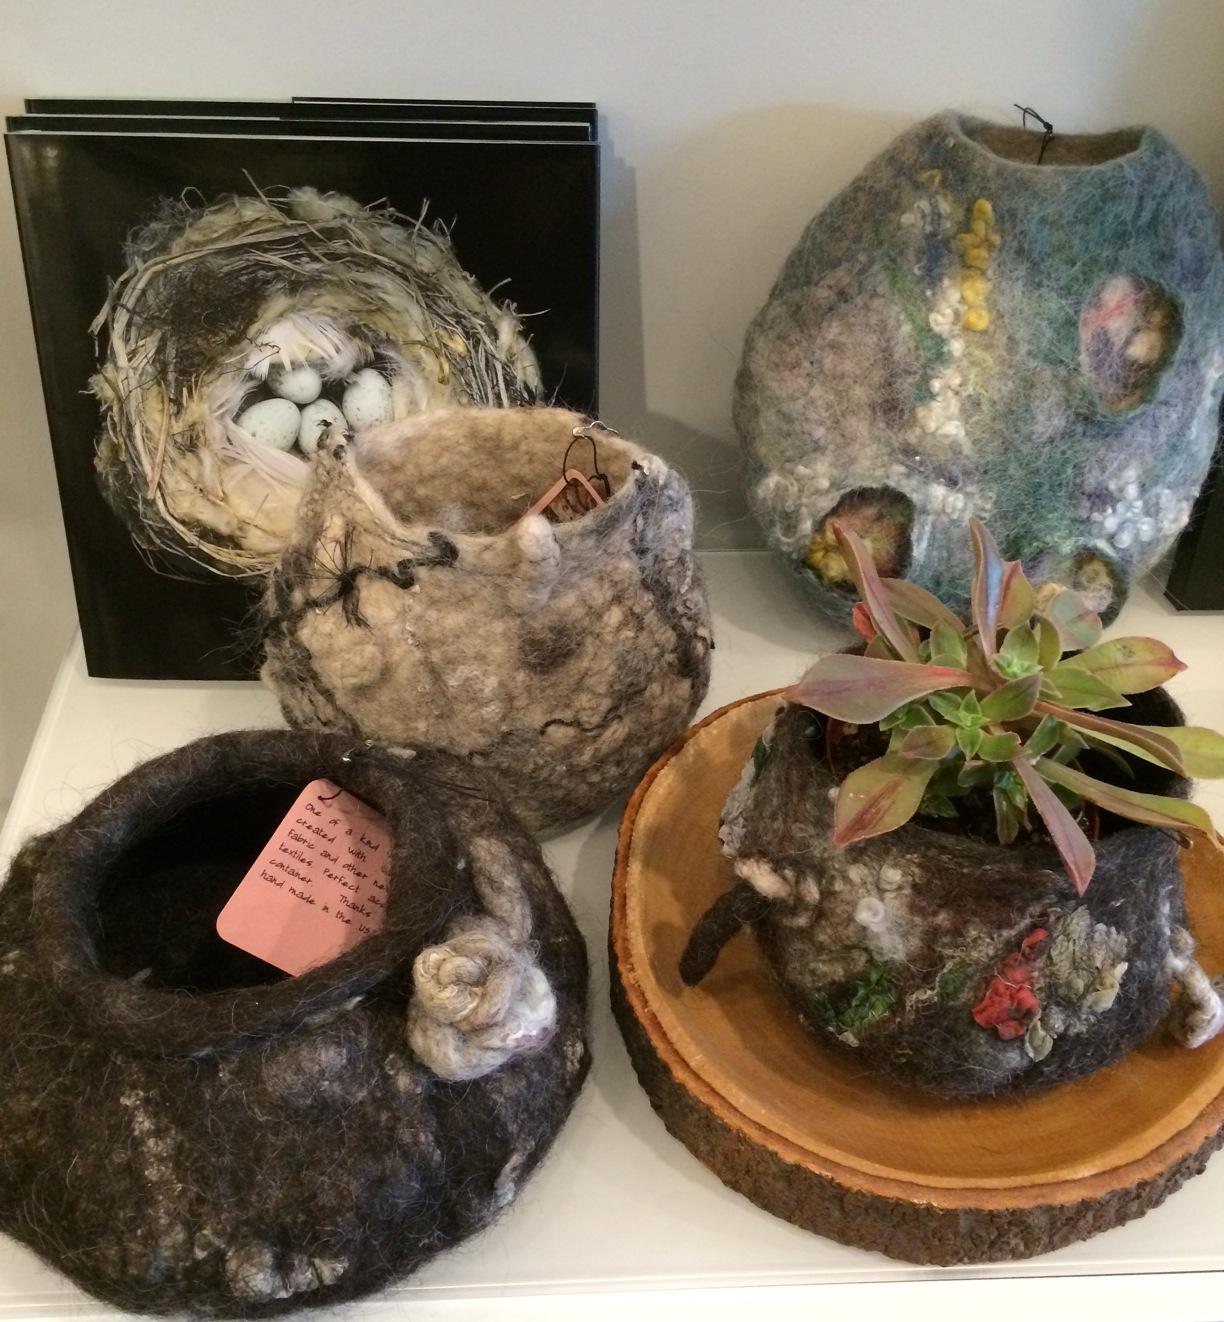 Quartet of hand-made felt vessels